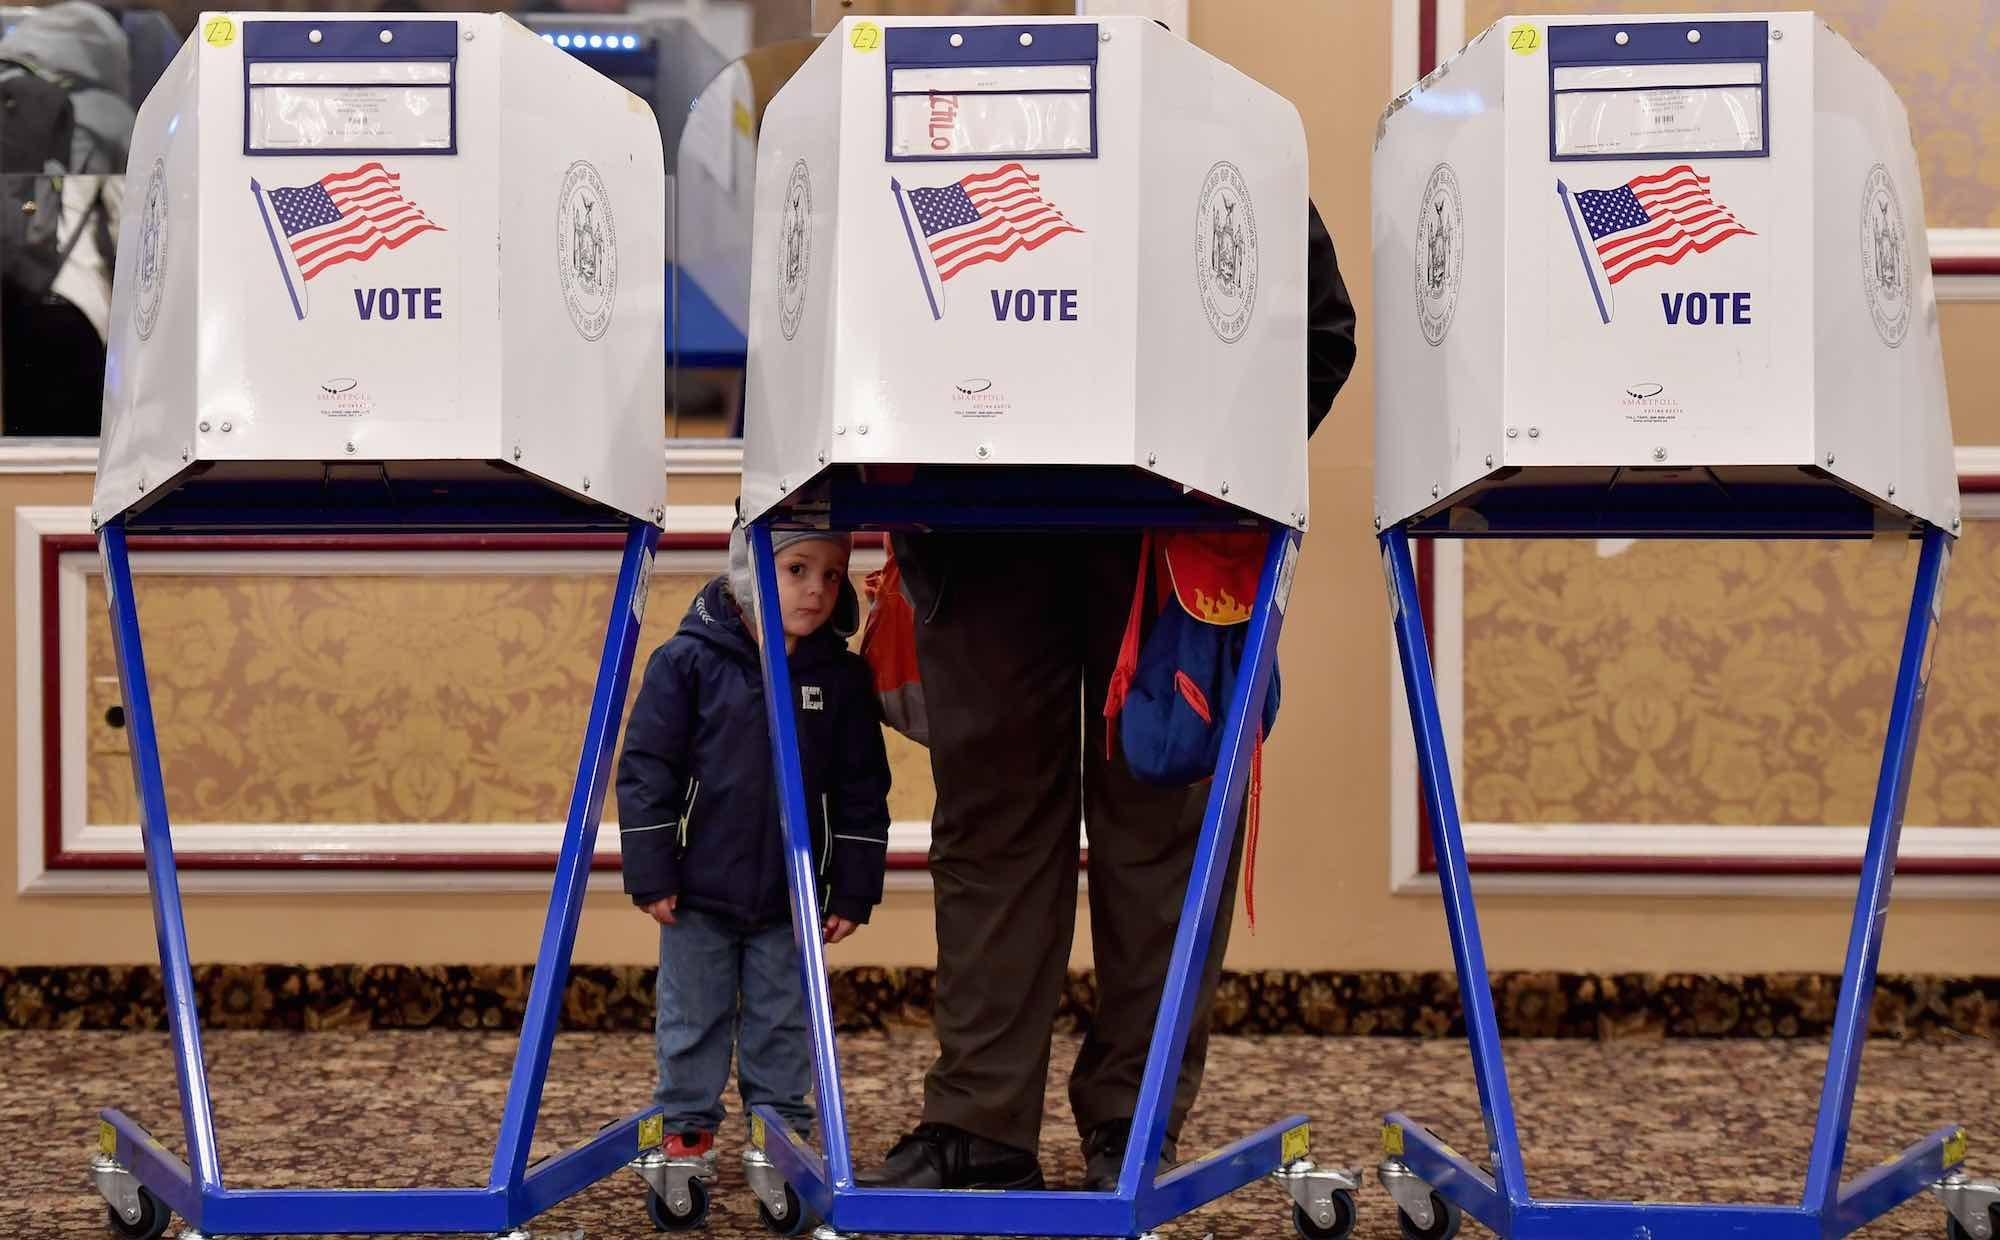 Judgement on the ballot (Photo: Angela Weiss via Getty)